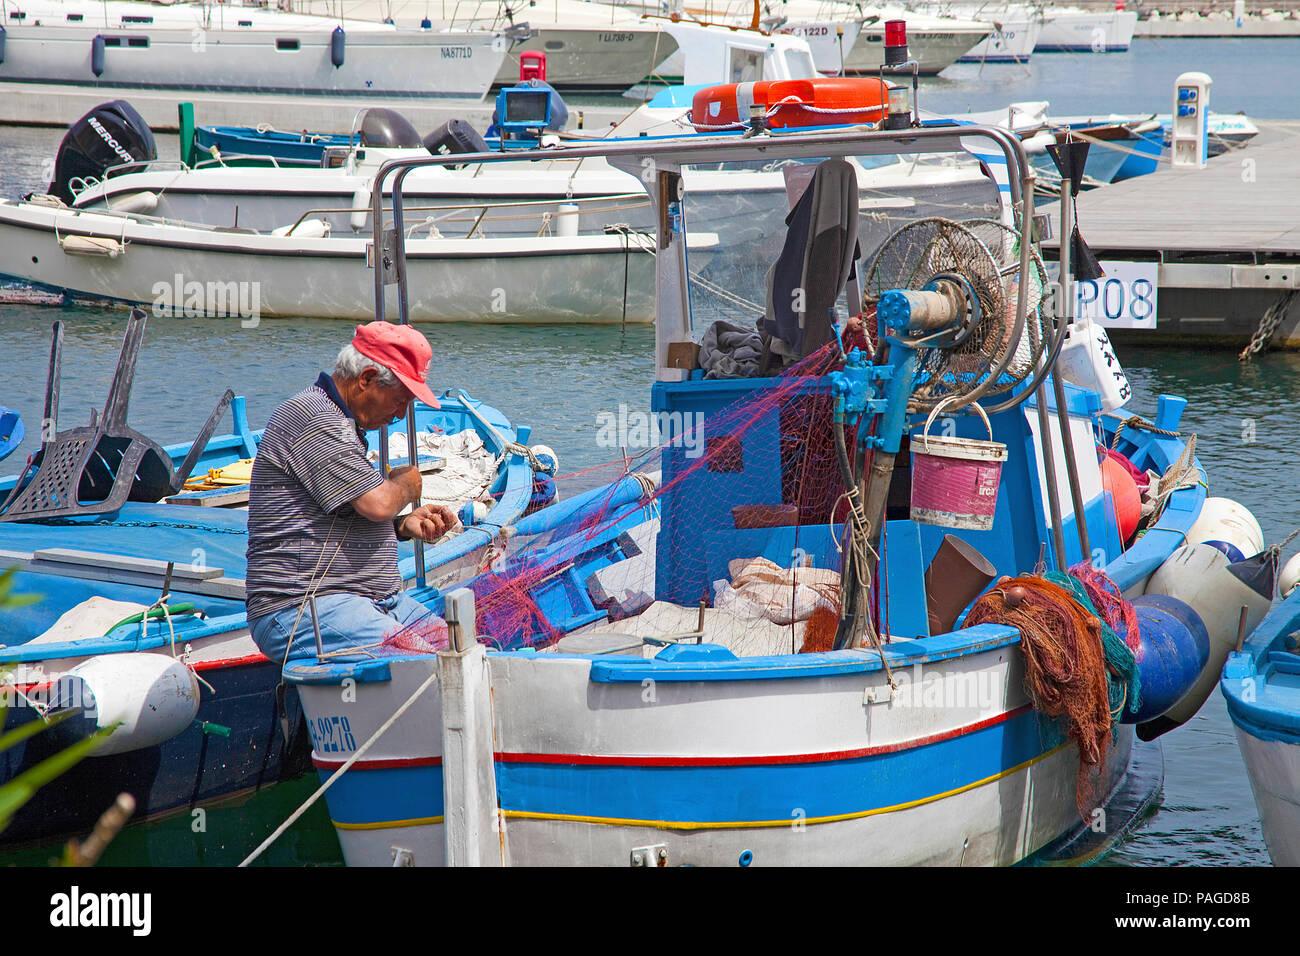 Fisherman on fisherman's boat repairing fishing nets  Marina Grande, Procida island, Gulf of Naples, Italy - Stock Image